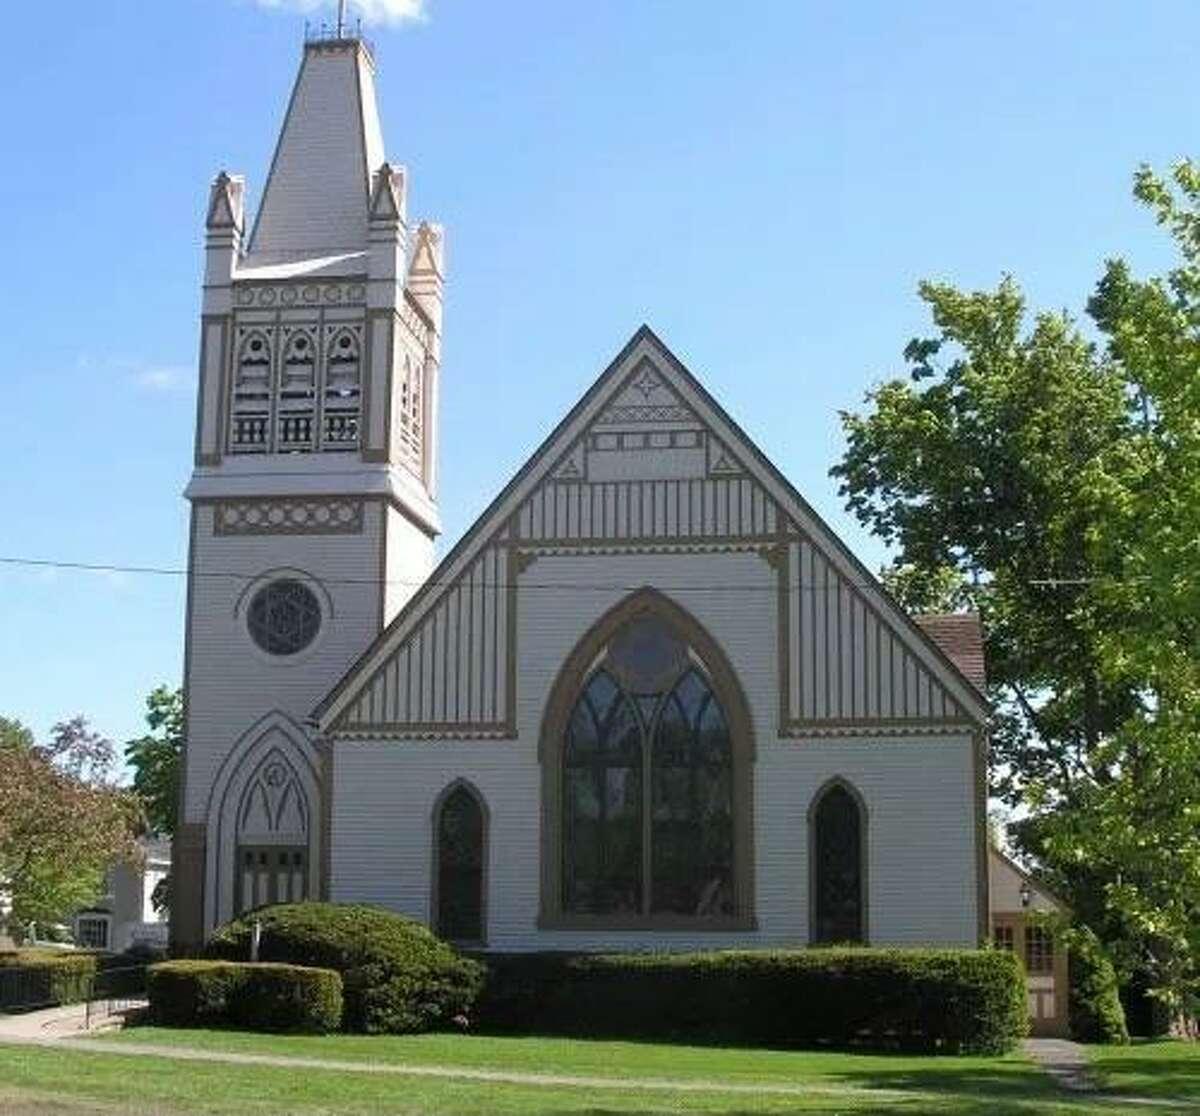 The historic United Methodist Church in Litchfield.